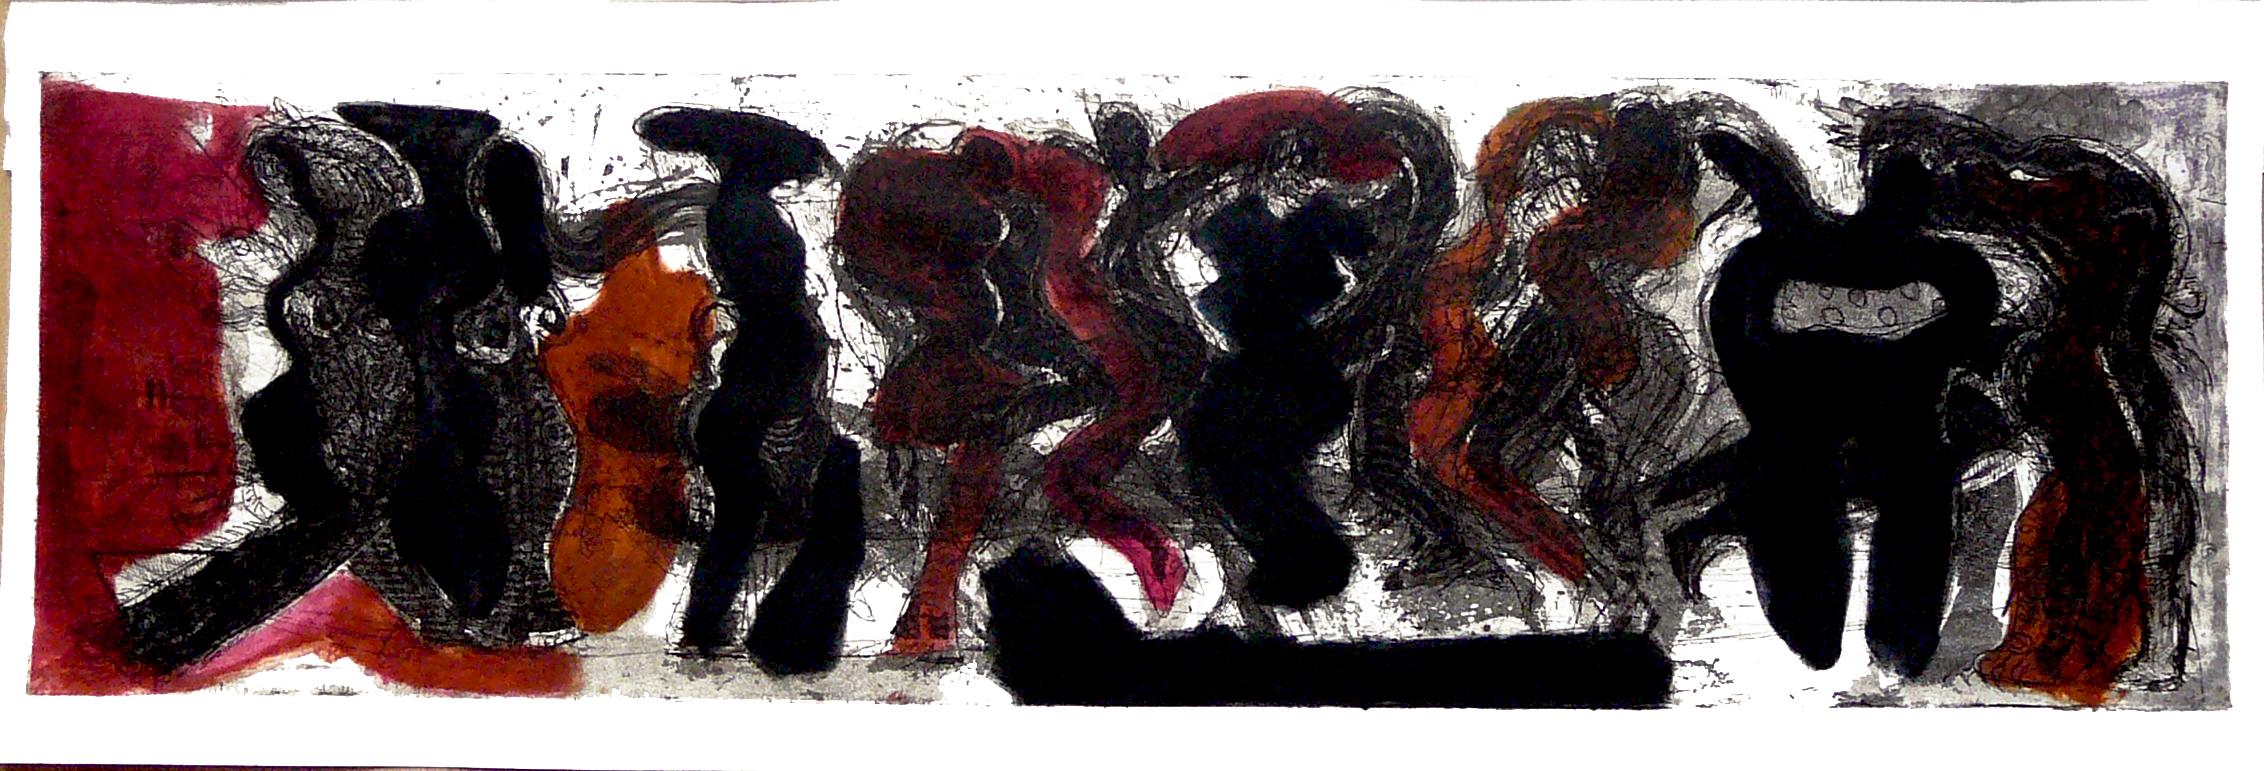 cueva nov 2011 3.jpg